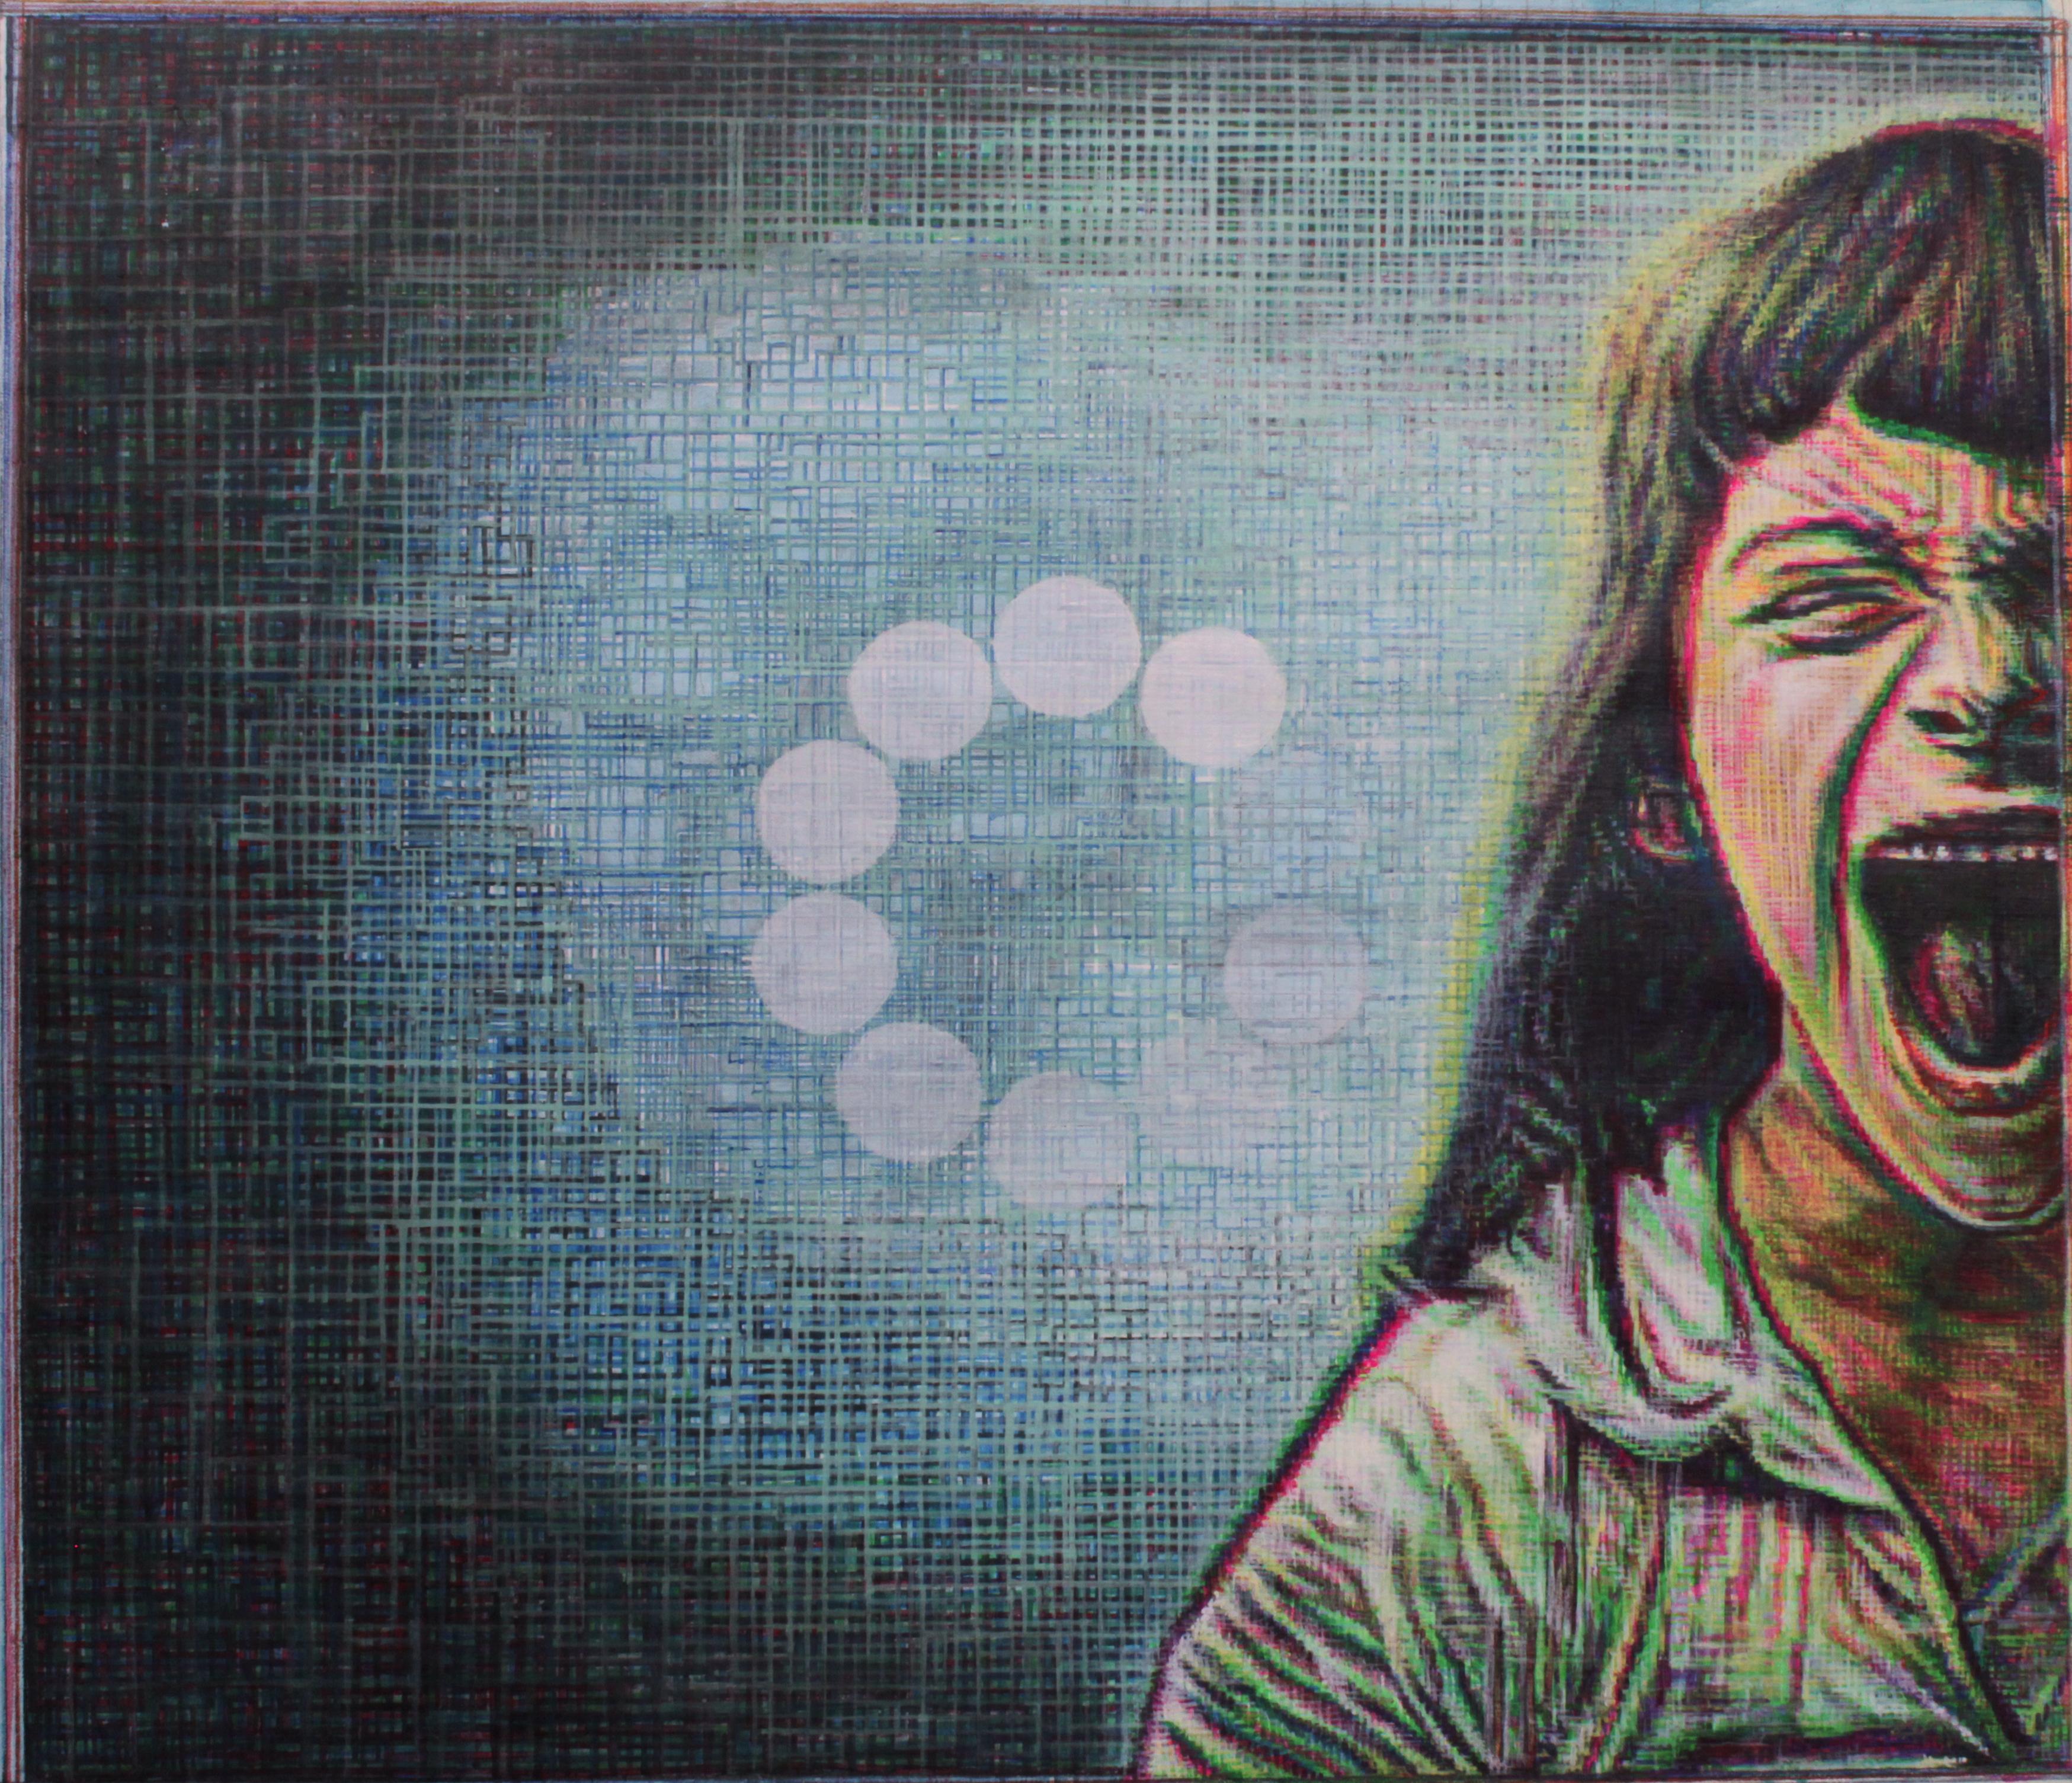 Play (the scream)